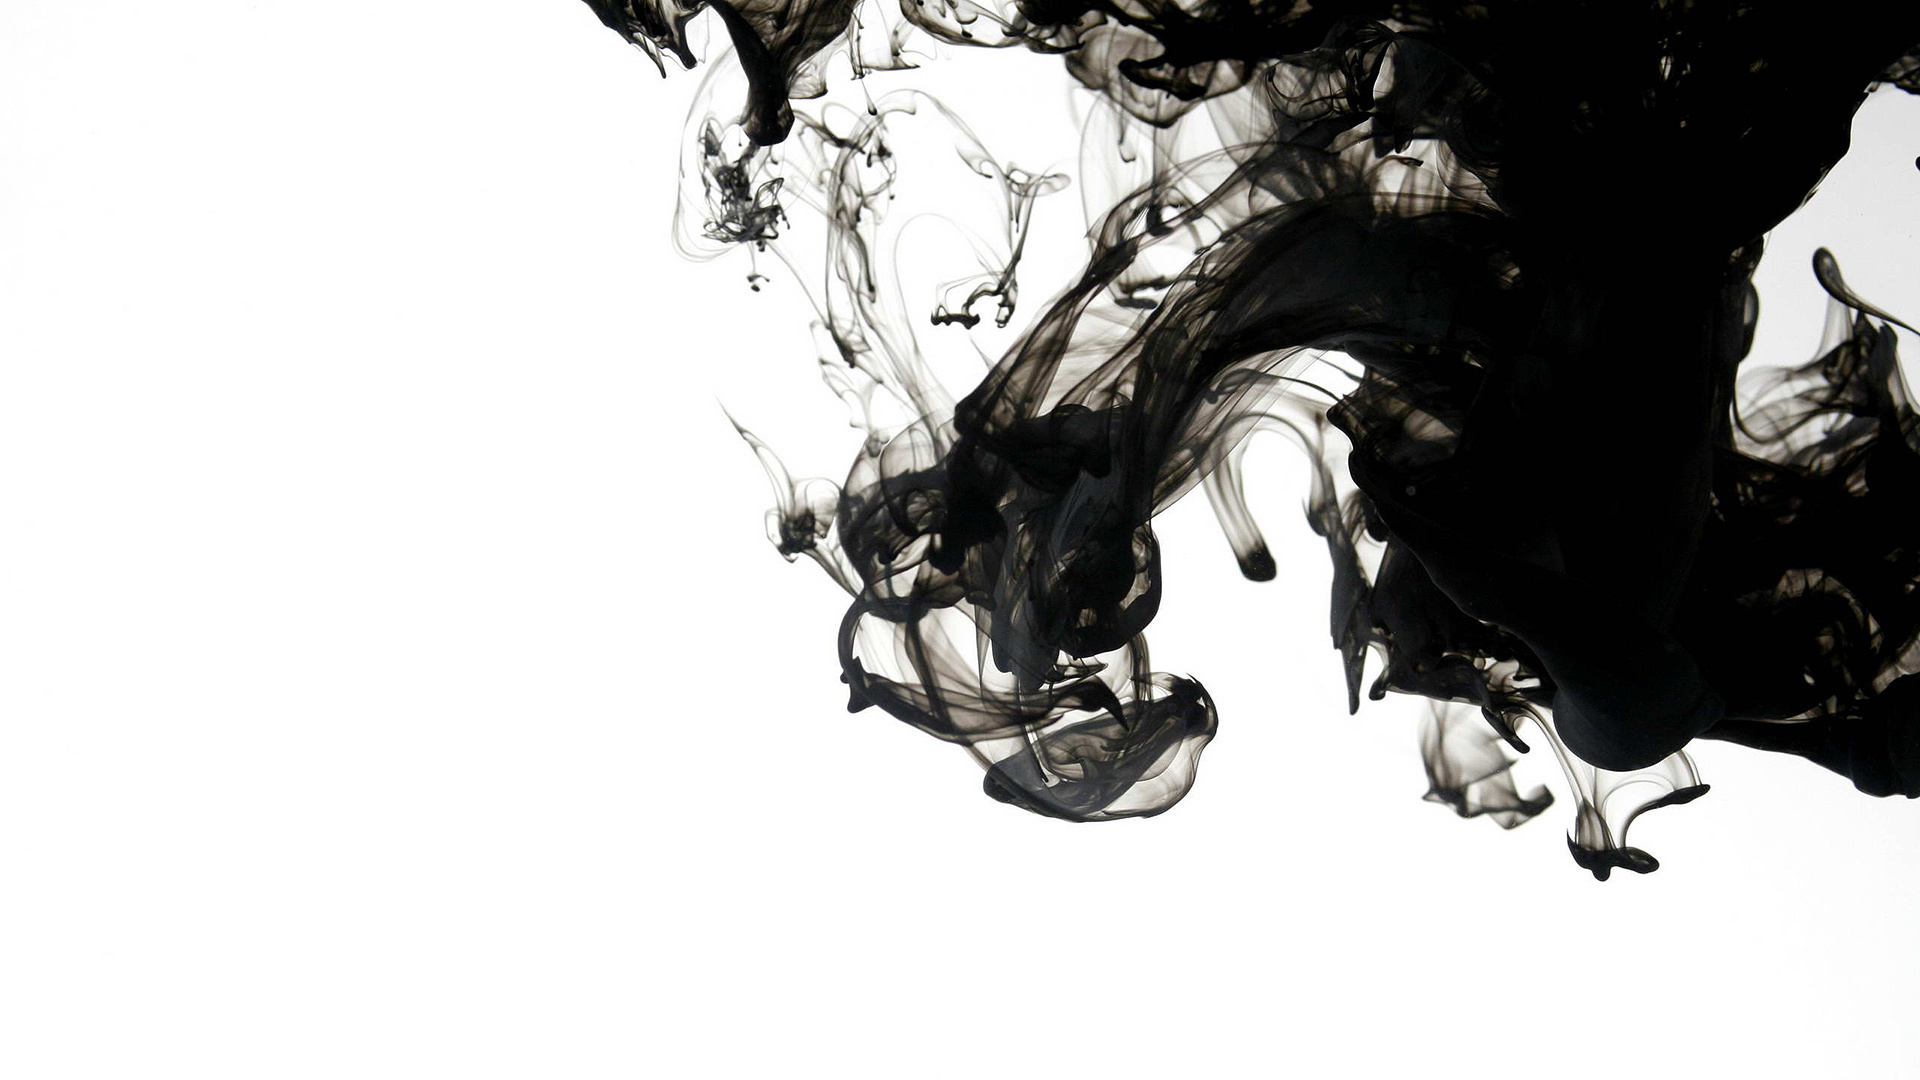 Lonlliness fashinobi - White abstract background hd ...